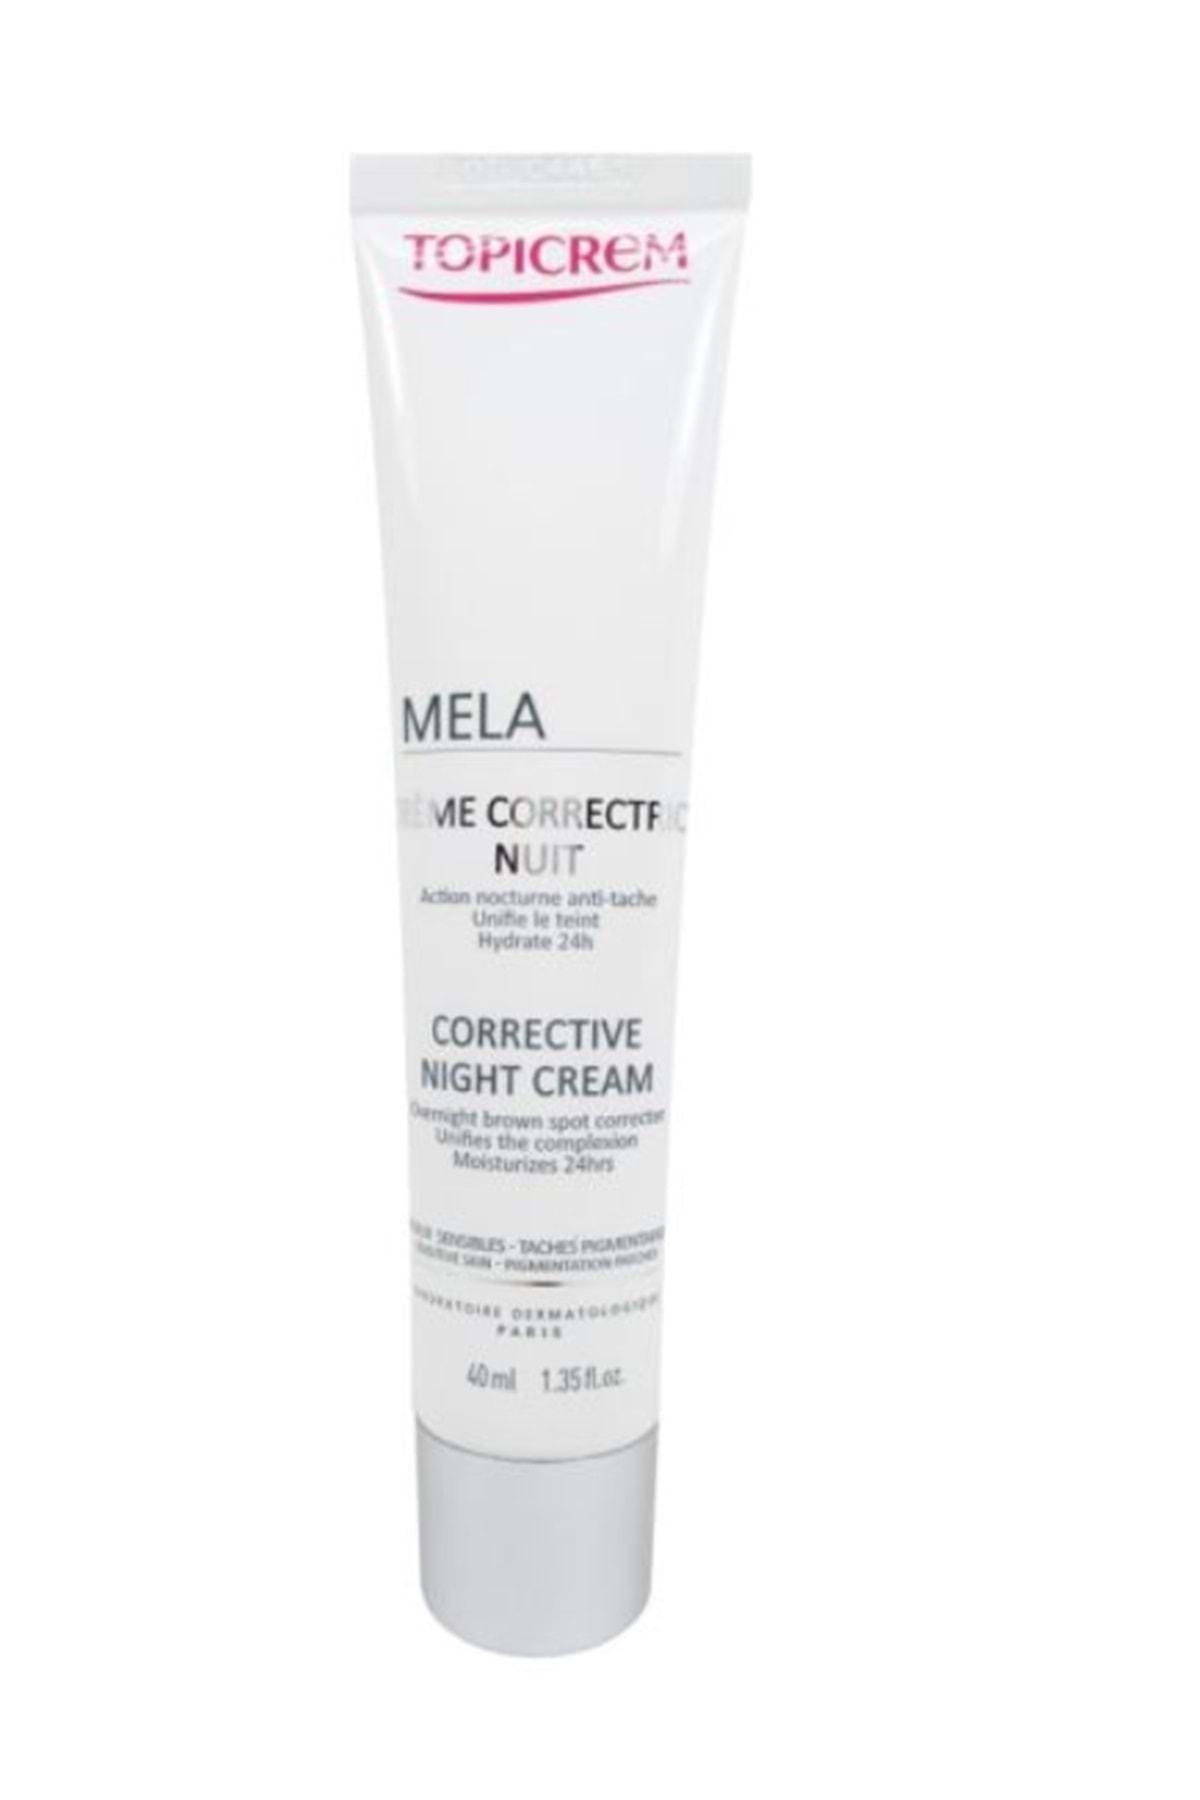 Topicrem Mela Corrective Night Cream 40ml 1